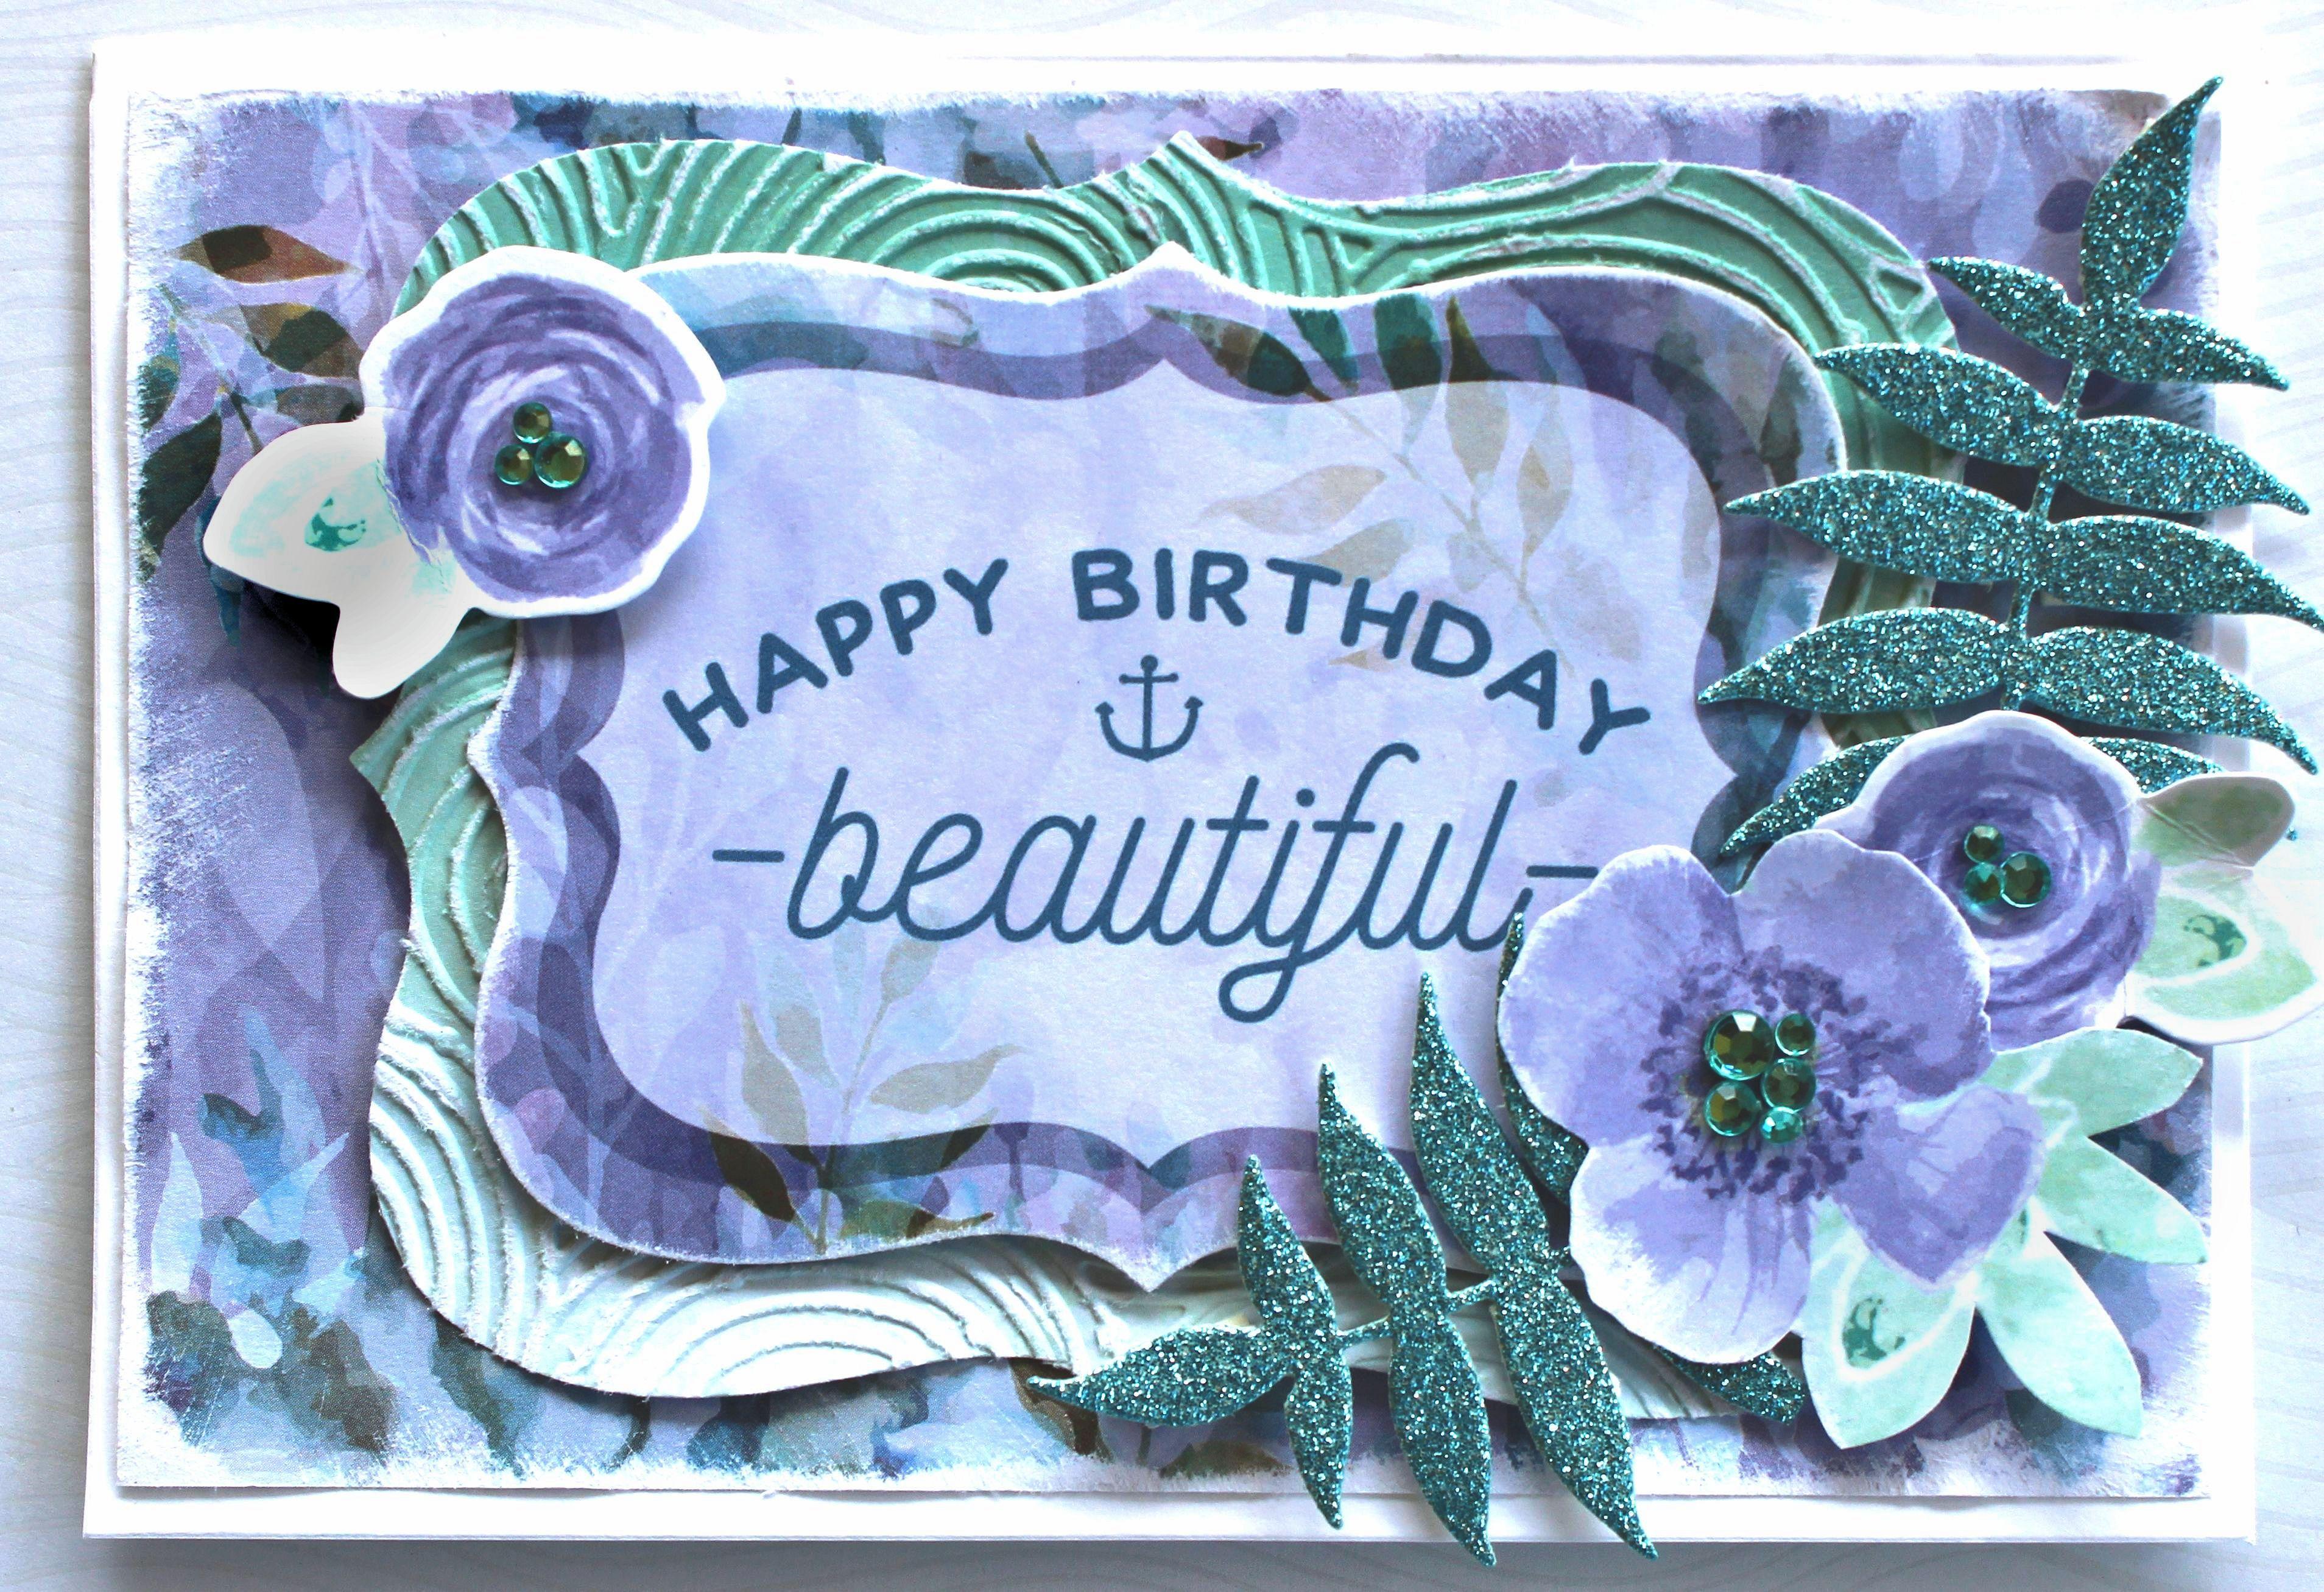 Kaisercraft Mermaid Tails & Glitter Cardstock - Birthday Card